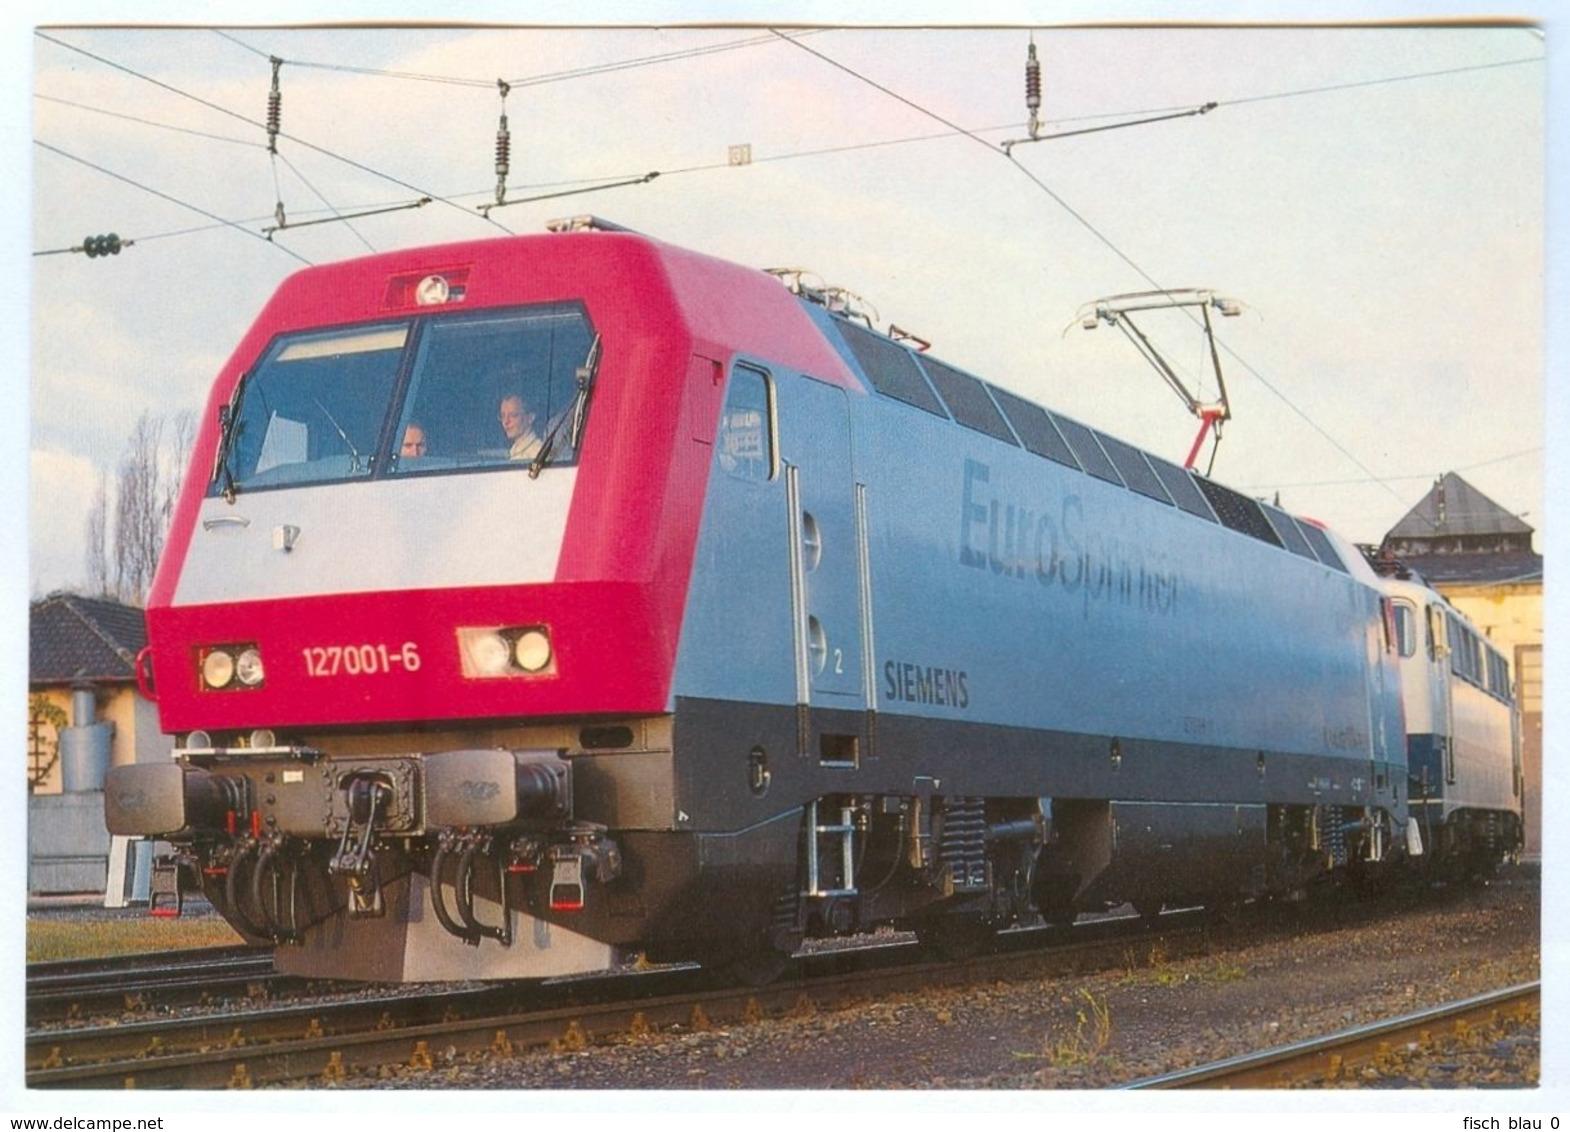 AK Eisenbahn Nürnberg Elektro-Versuchslok 127-001-6 EuroSprinter 1992 REIJU Colorkarte DB Franken Deutschland - Eisenbahnen